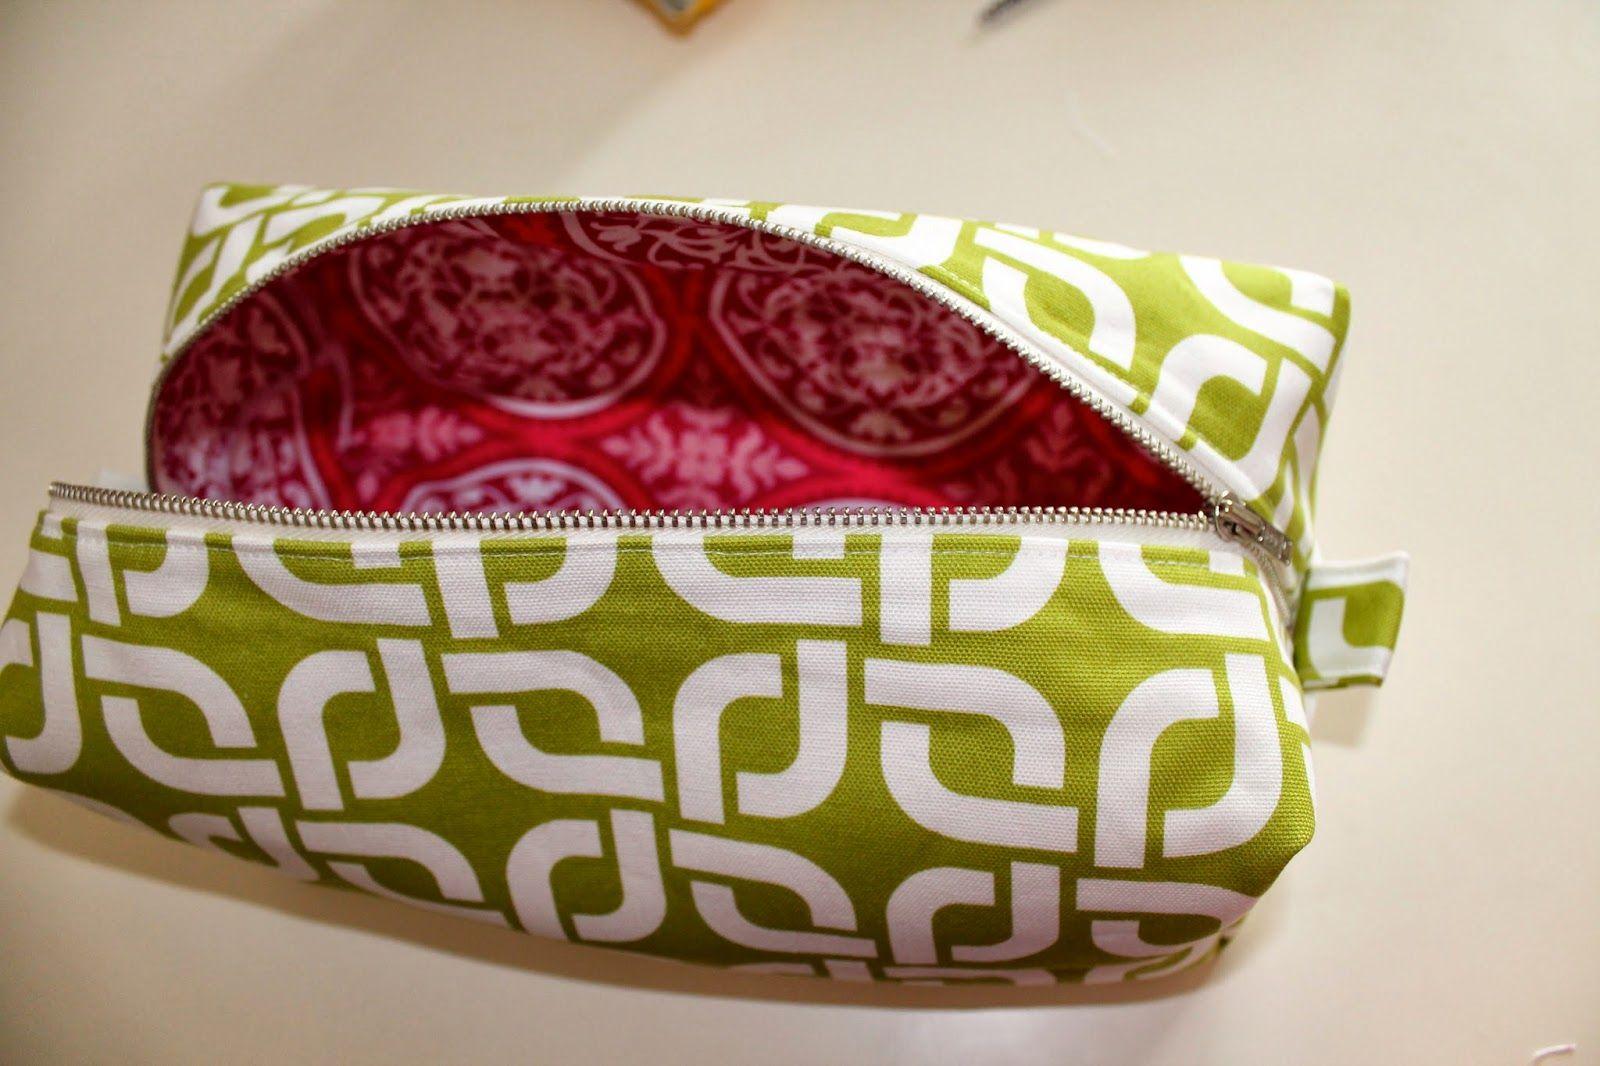 Kelbysews Boxy Bag Tutorial Boxy Bags Tutorial Boxy Bags Box Bag Pattern